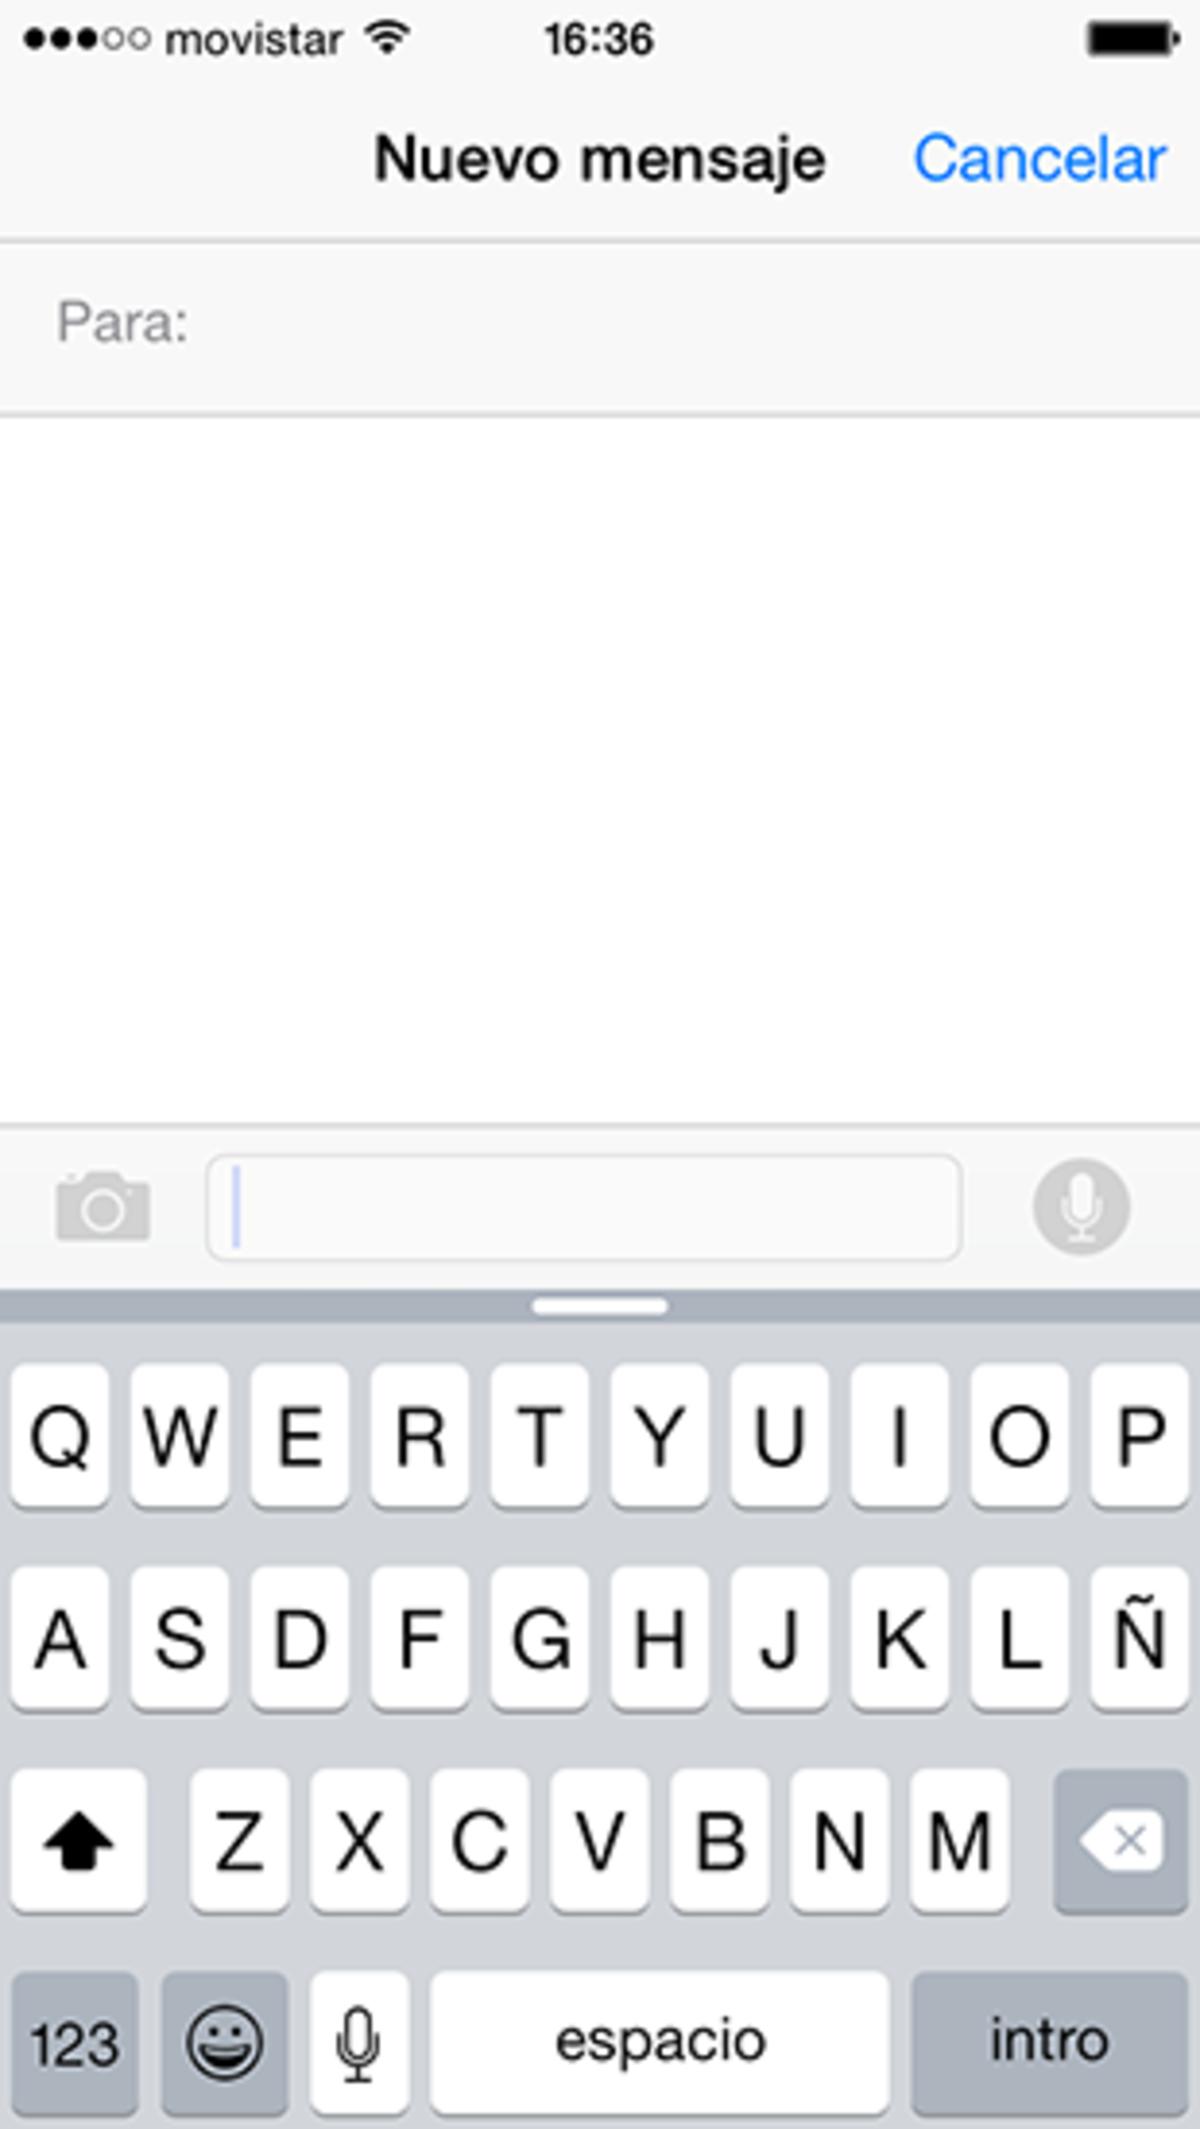 ocultar_texto_predictivo_iphone_ipad_3